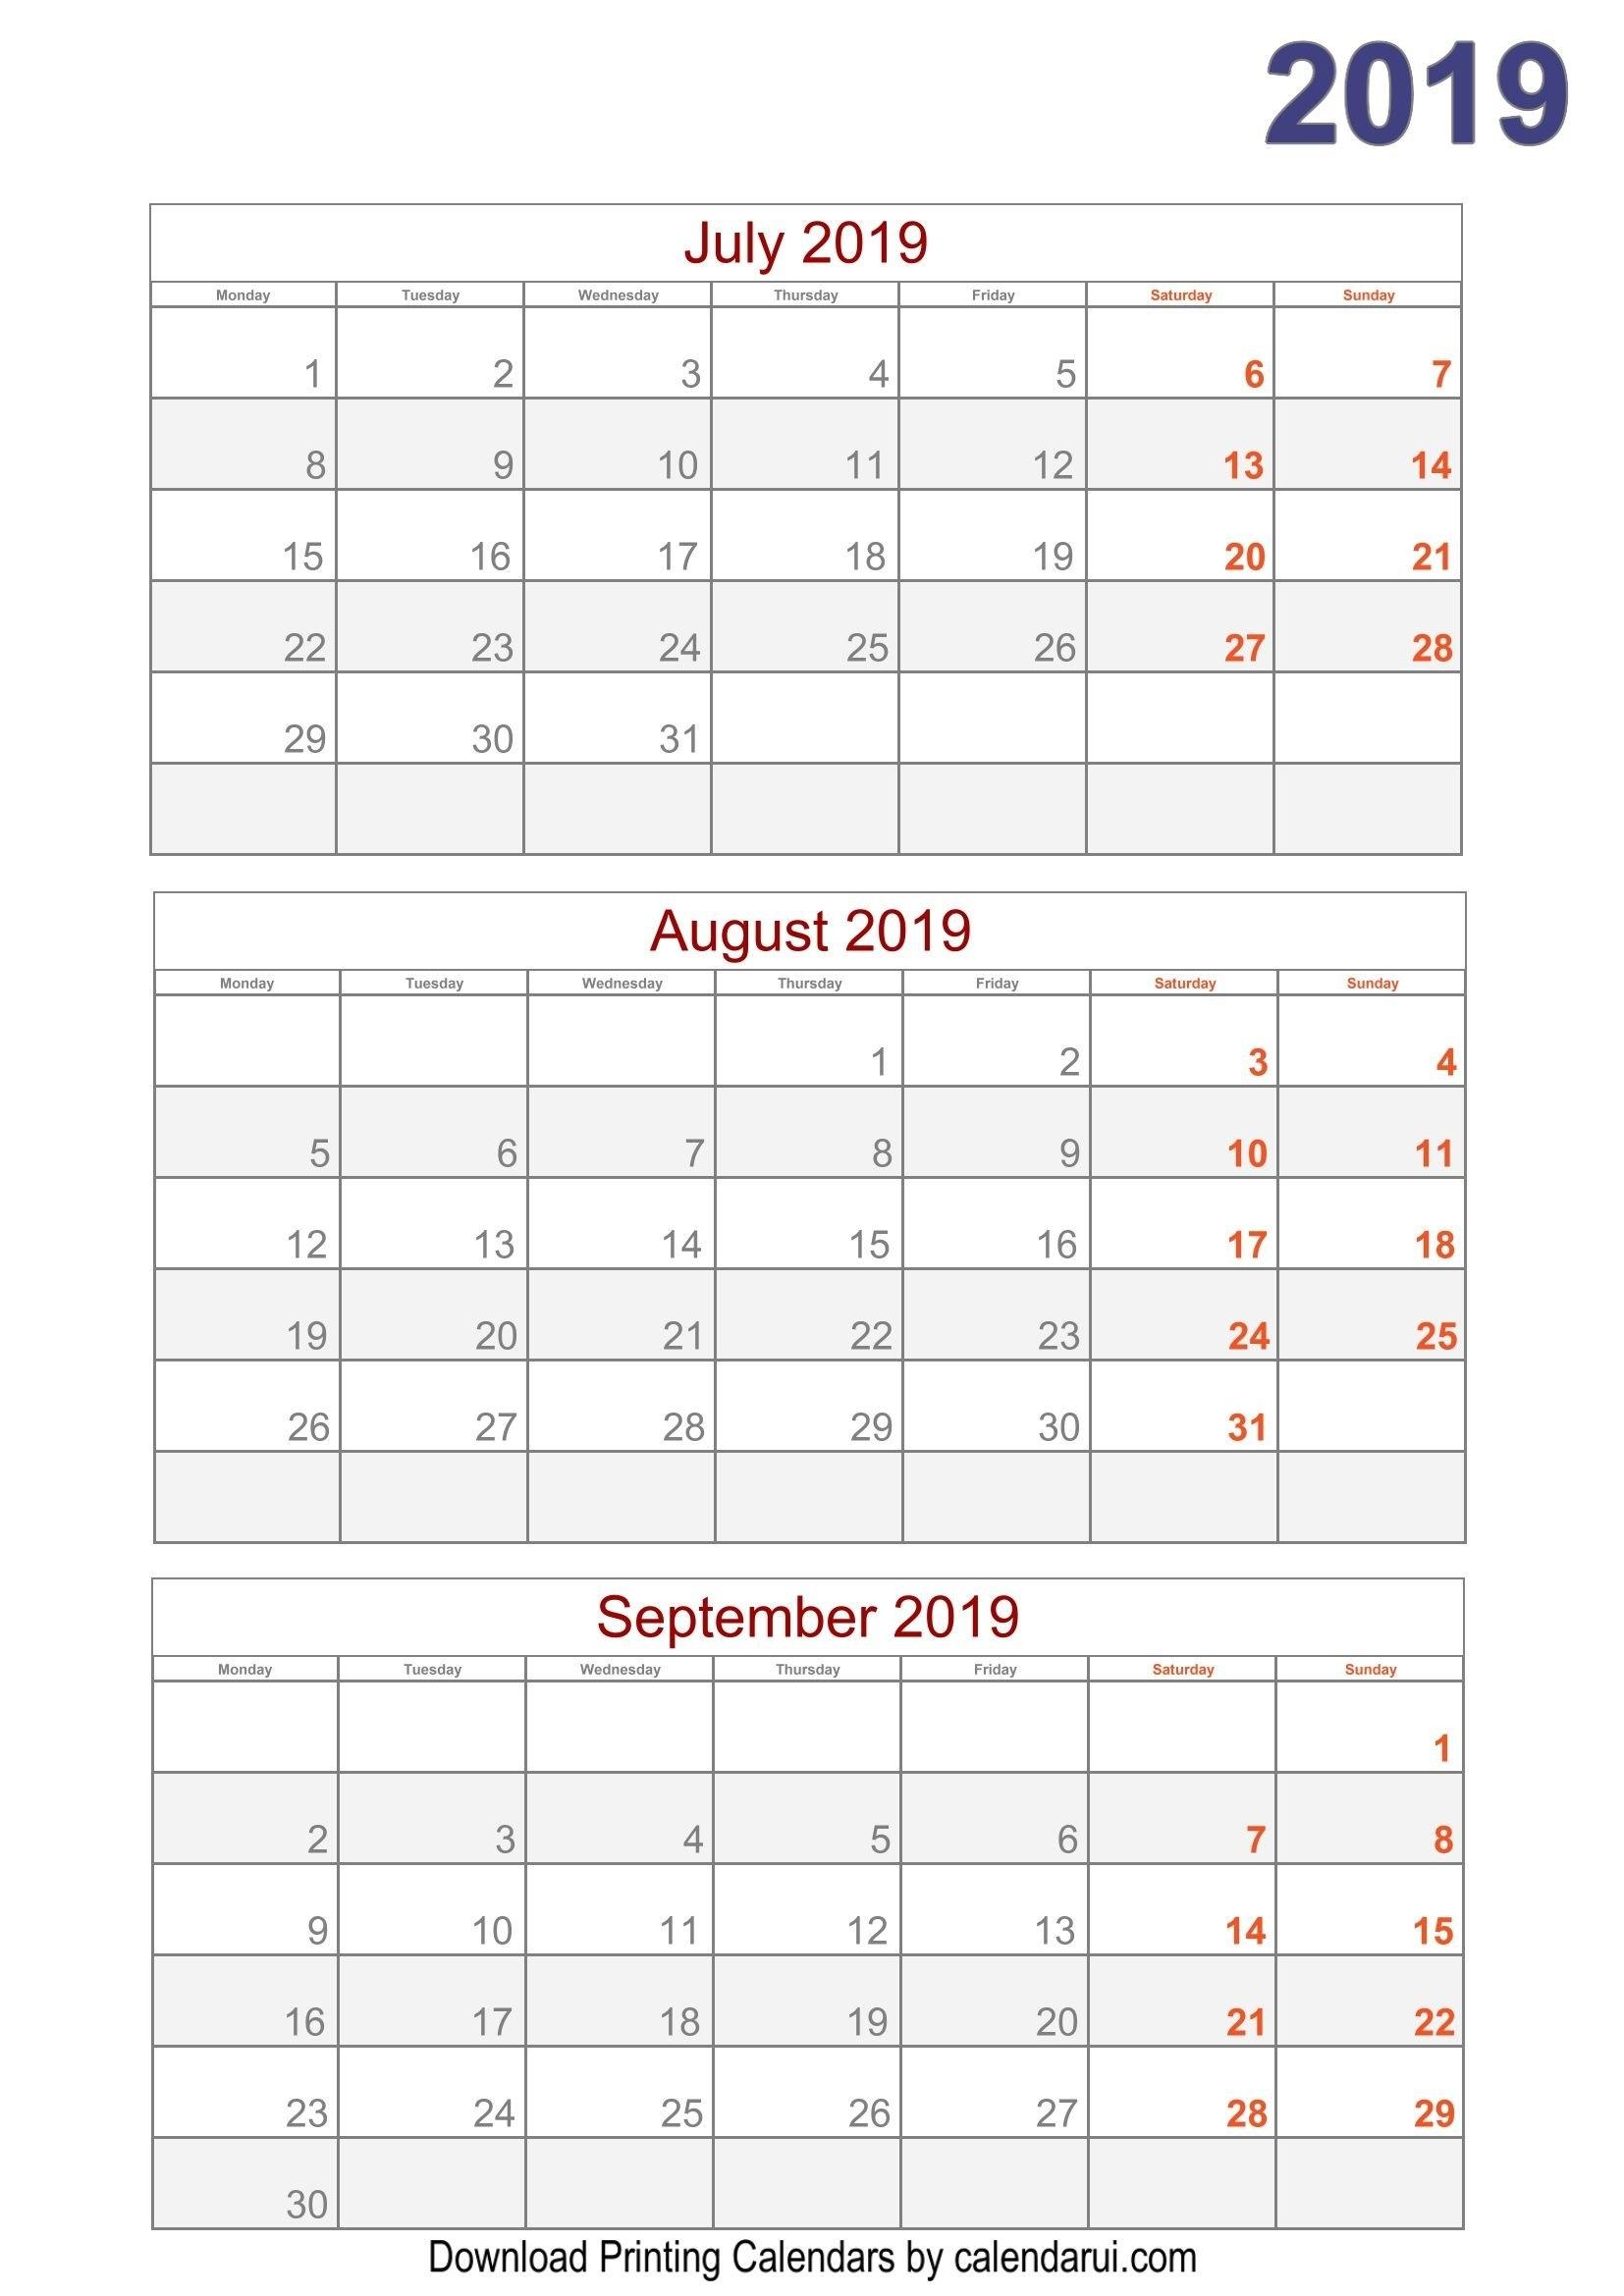 Download 2019 Quarterly Calendar Printable For Free   Calendar Calendar 2019 Quarterly